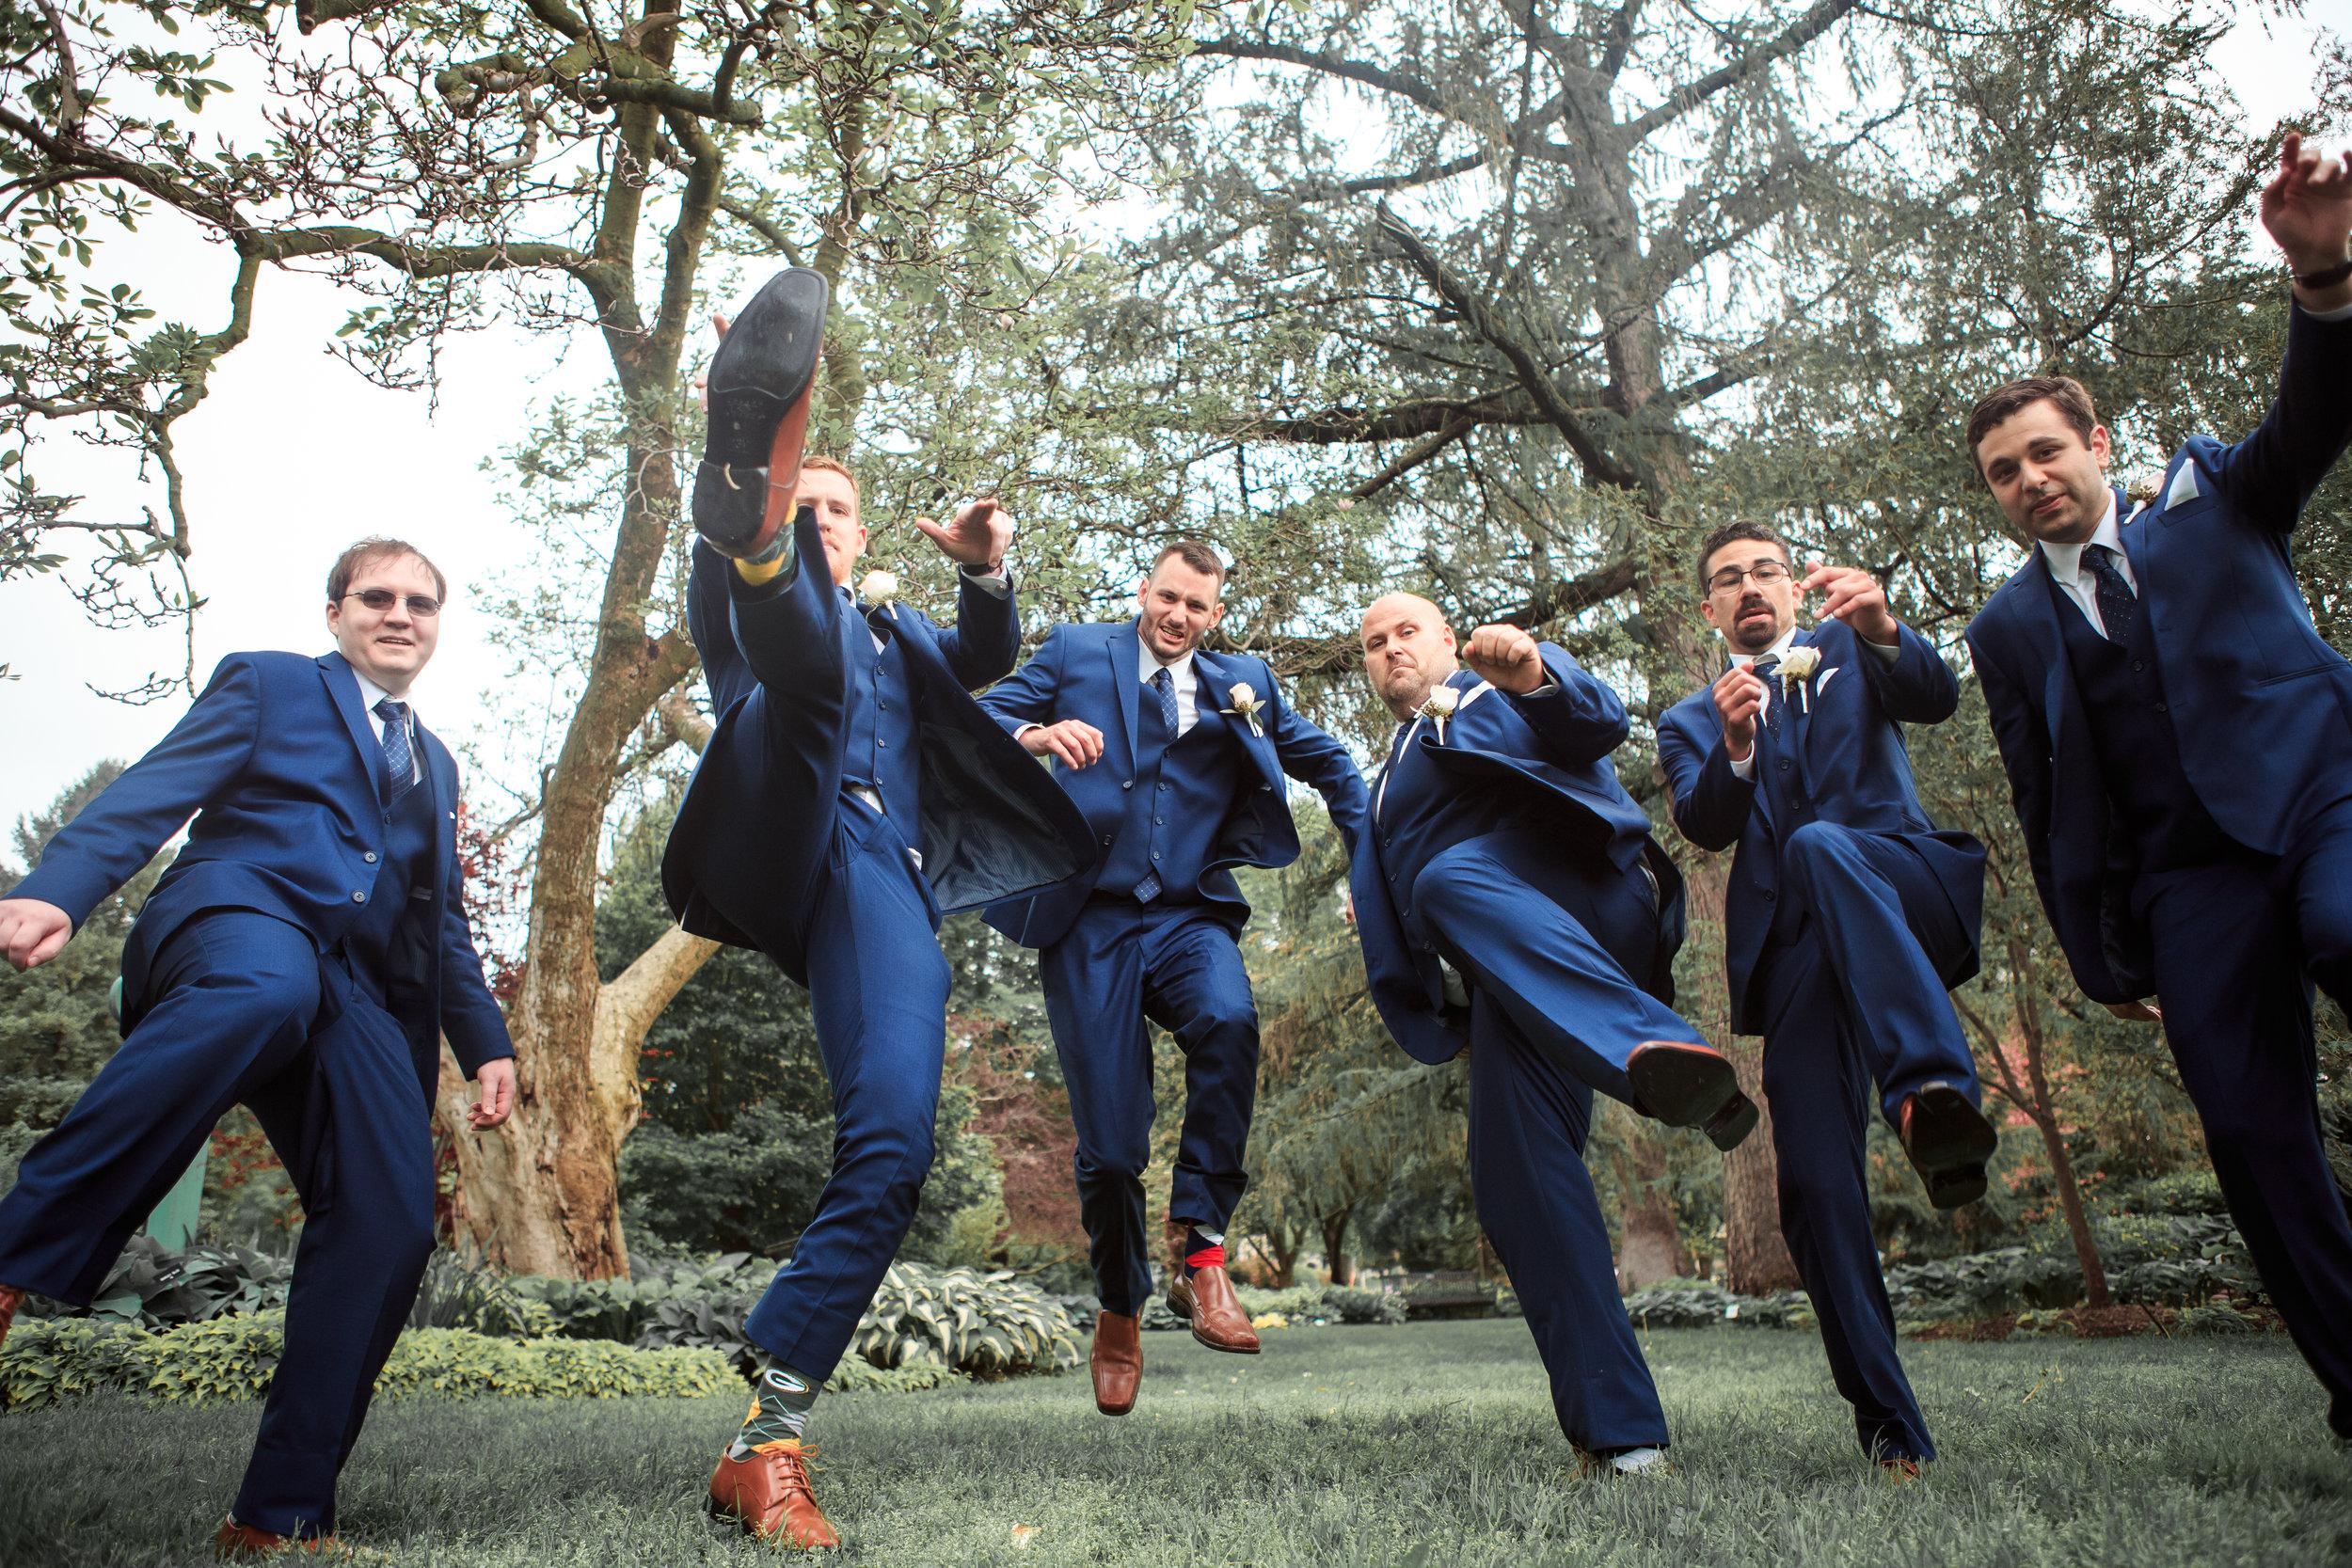 fun-groomsmen-wedding-photo-davenport-wedding.jpg